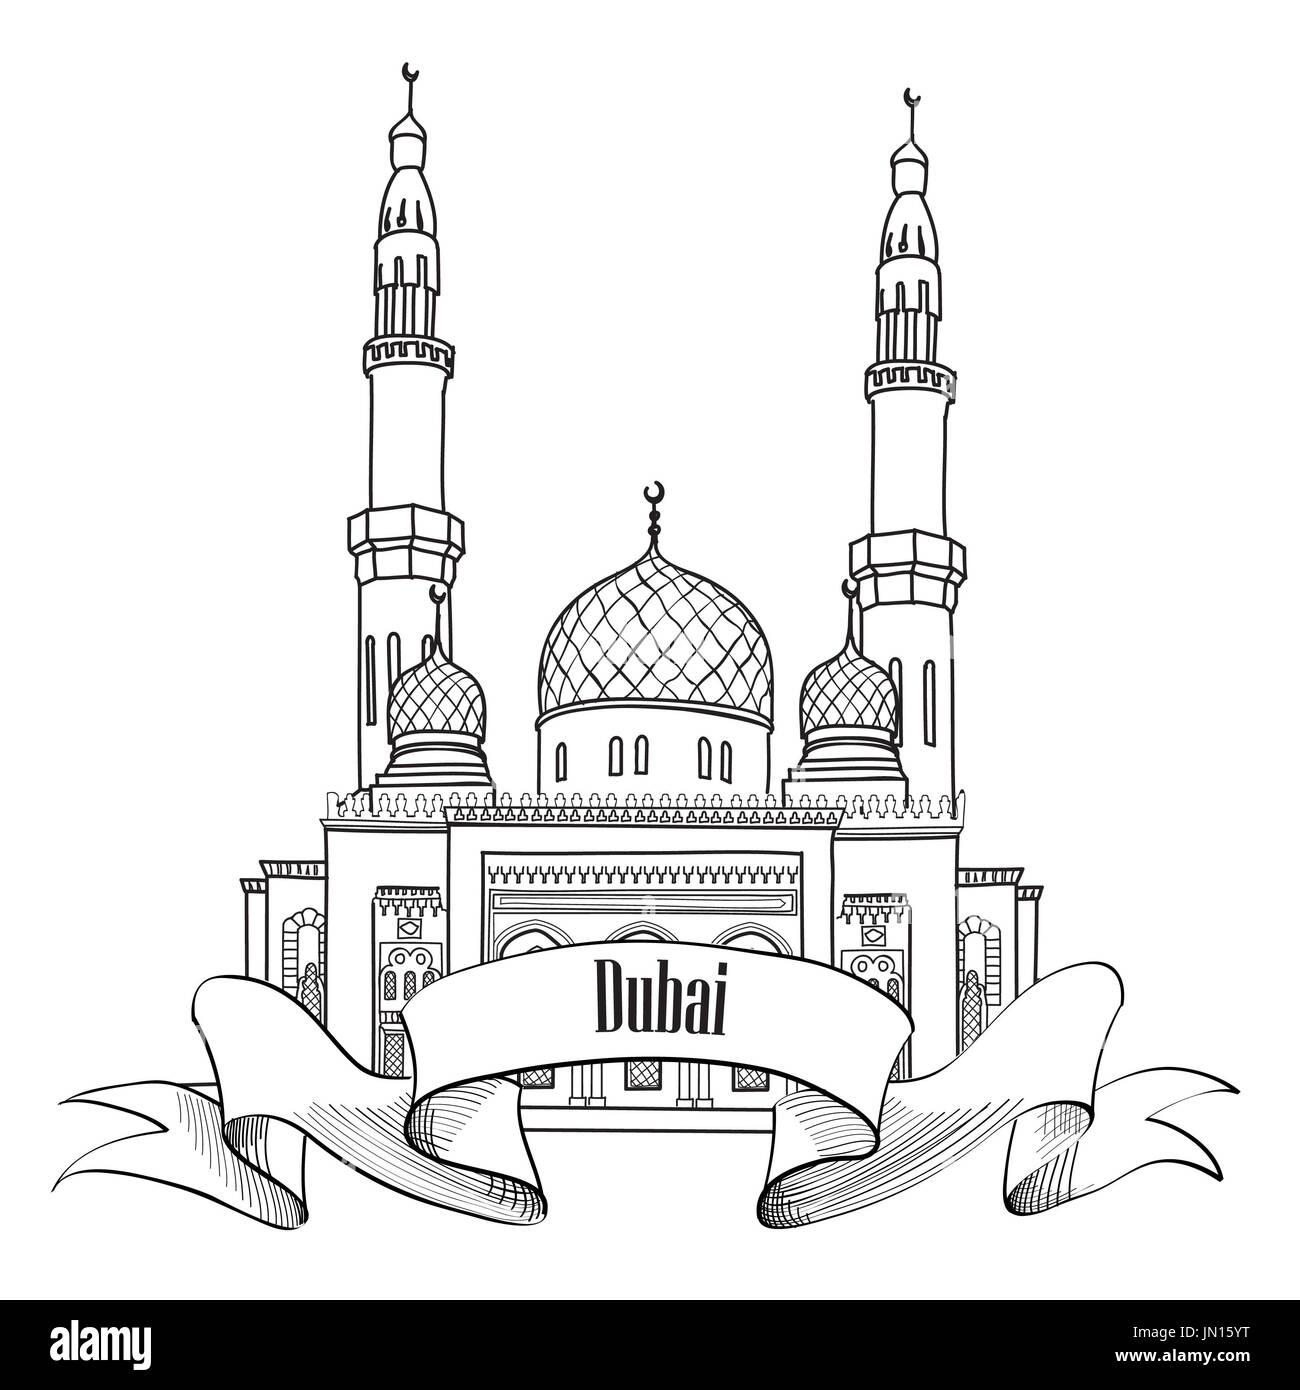 Dubai cut out stock images pictures alamy dubai city label travel uae symbol stock image buycottarizona Gallery